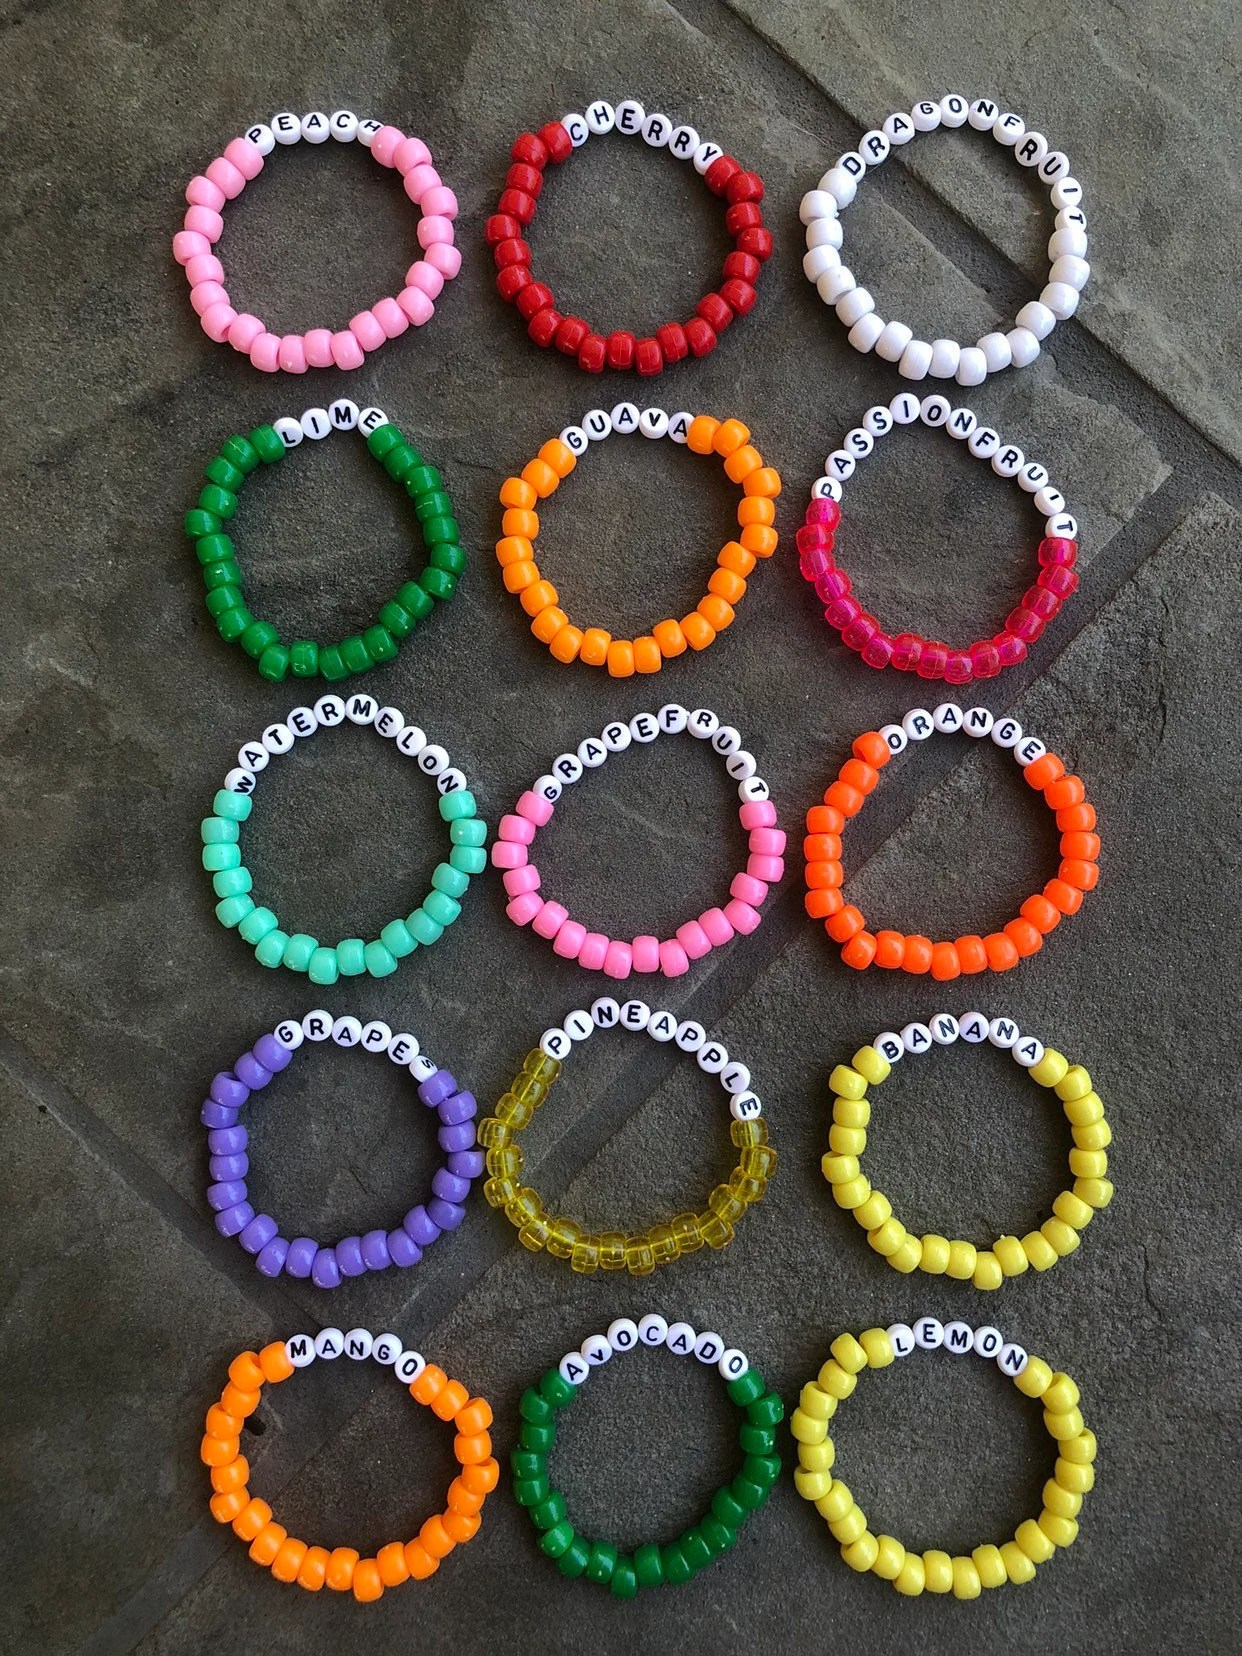 Vsco Bead Bracelets With Words : bracelets, words, Fruit, Armband, Sieraden